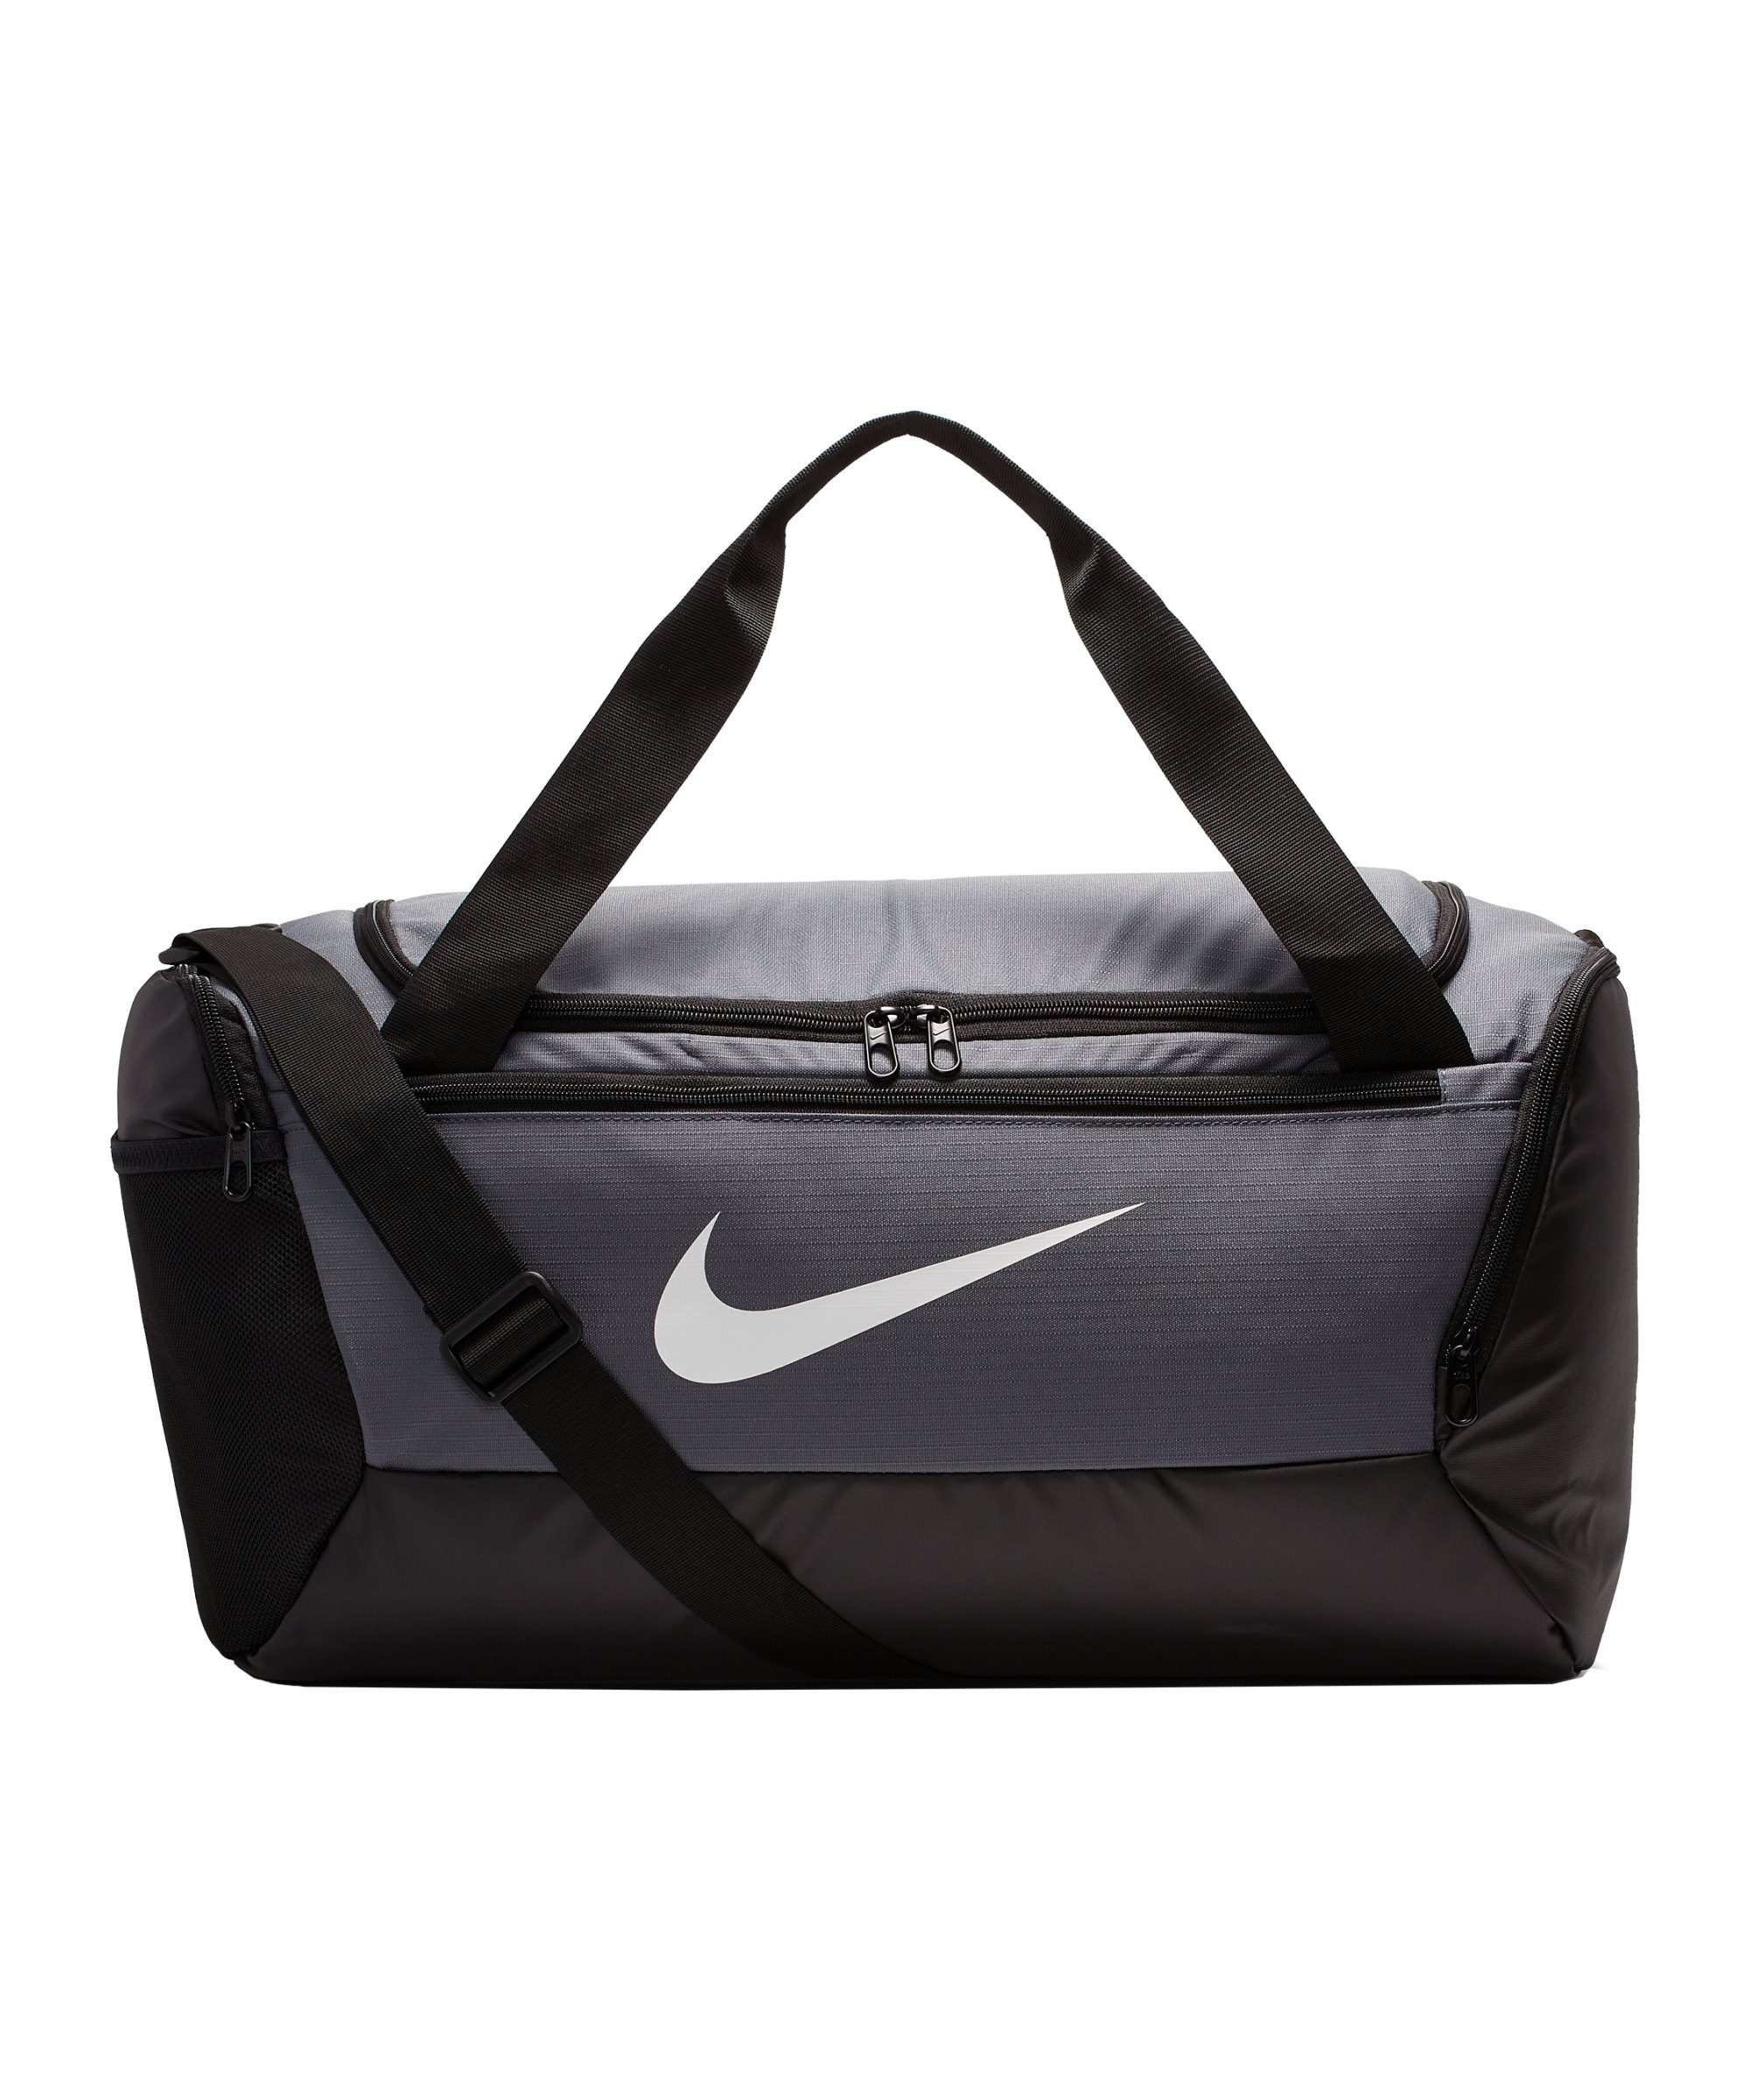 Nike Brasilia Duffel Bag Tasche Small F026 - grau